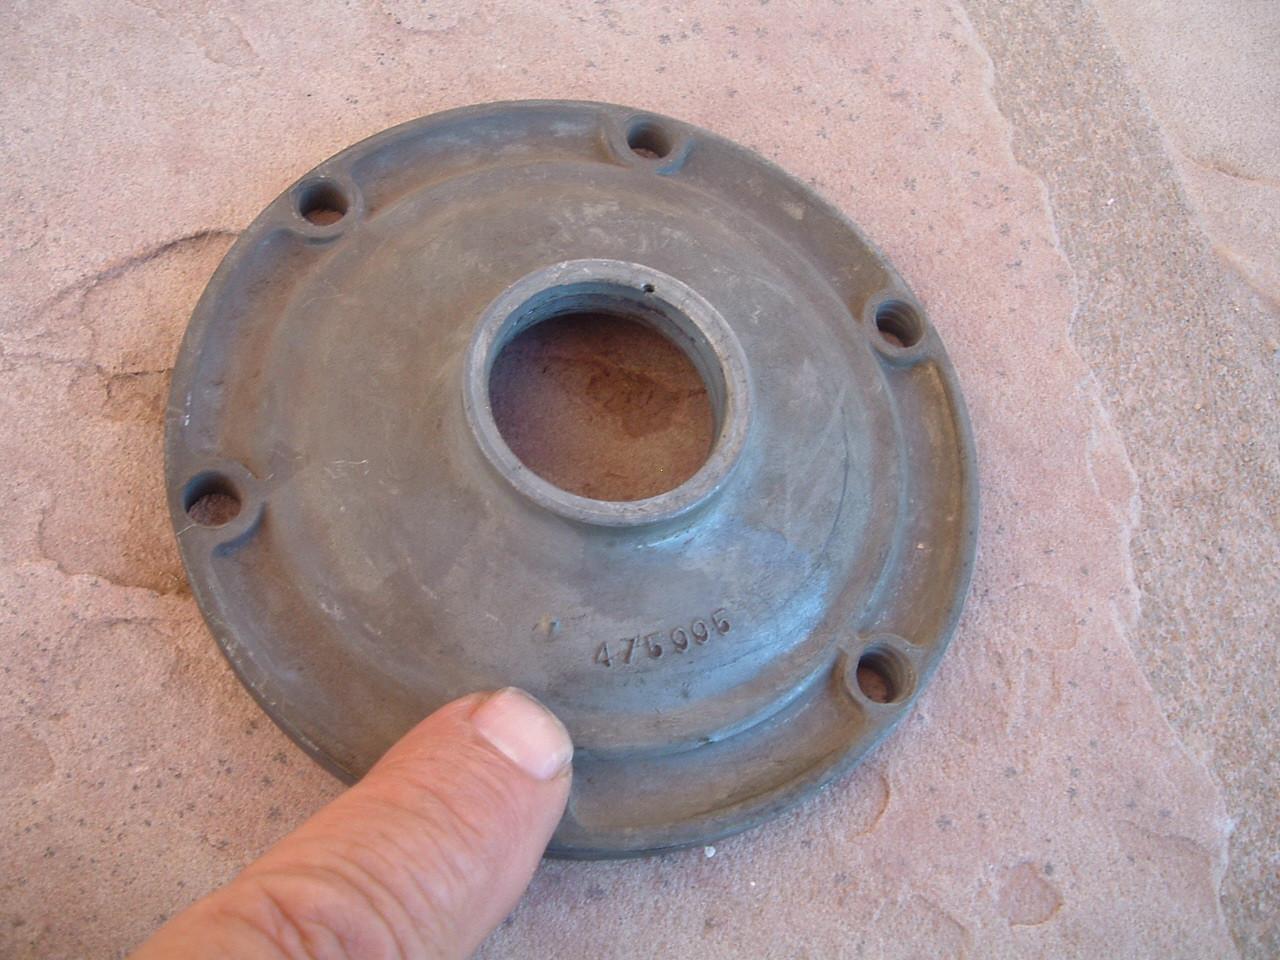 1935 1936 chevrolet transmission input shaft retainer nos gm 475995 (z 475995)